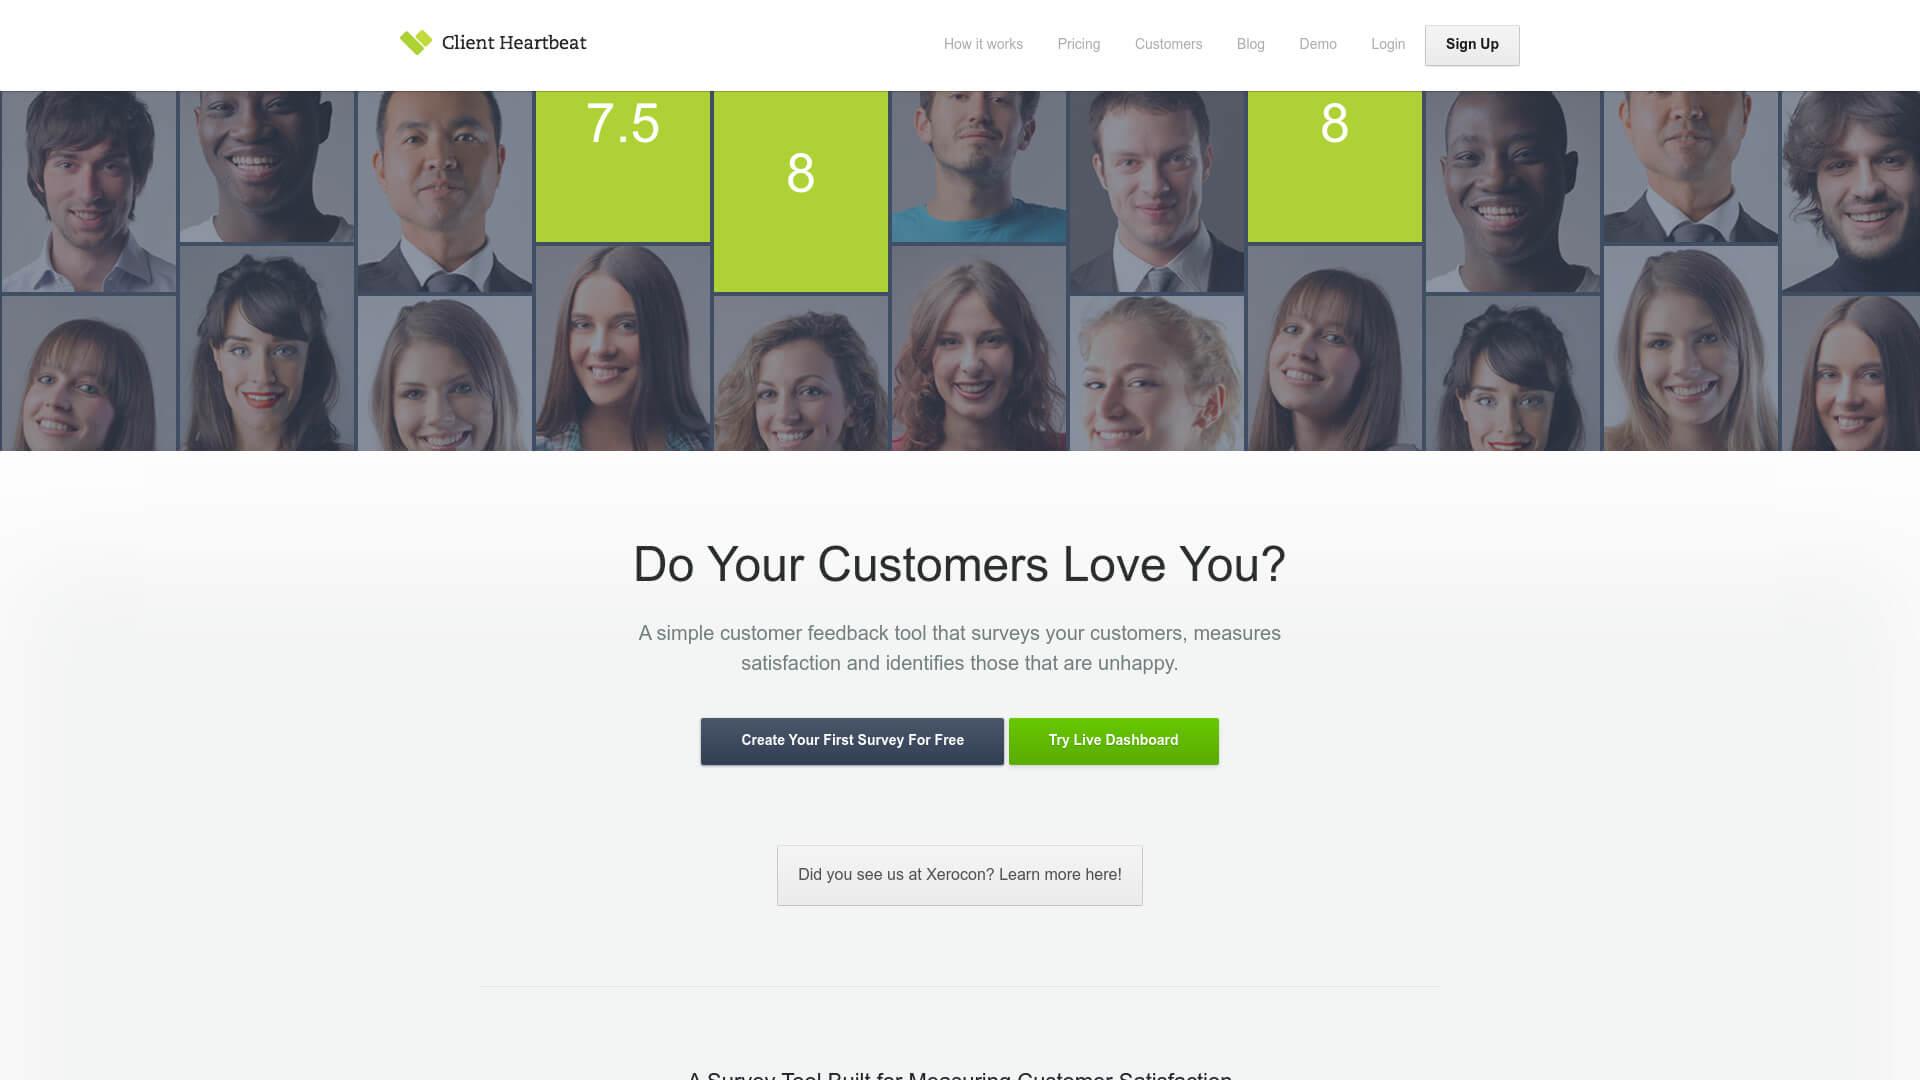 clientheartbeat